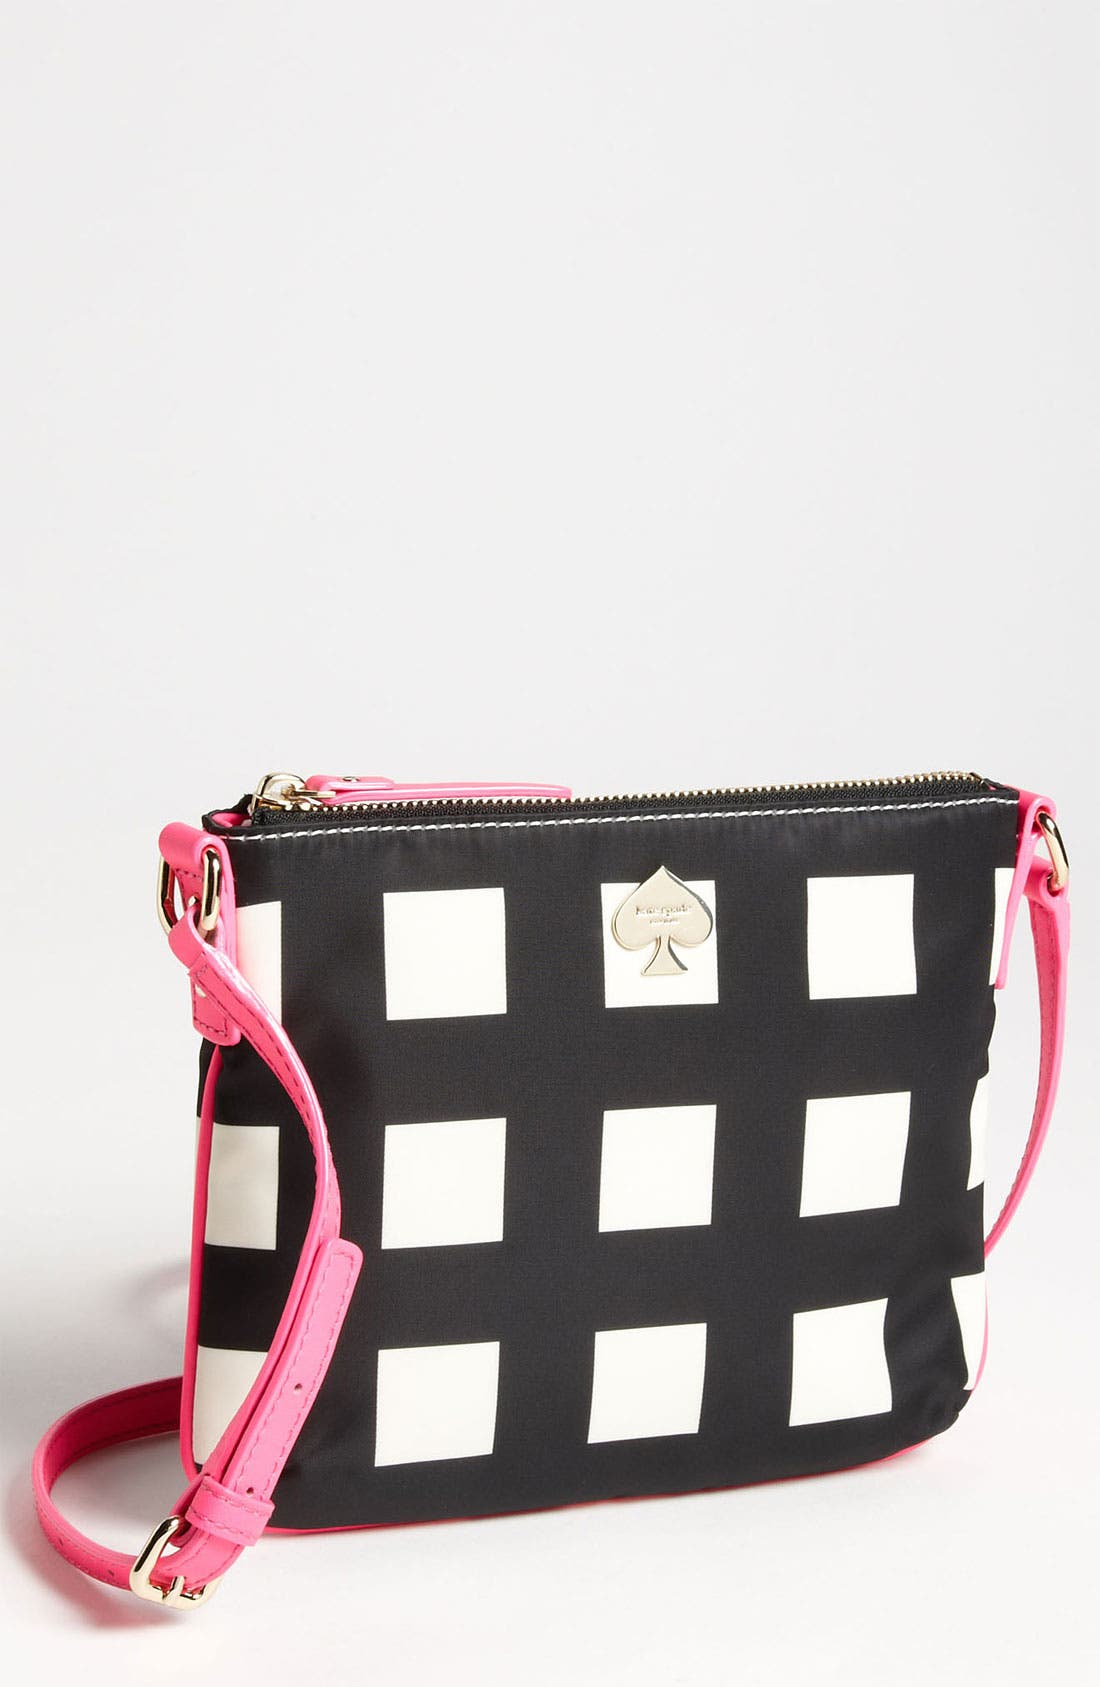 Alternate Image 1 Selected - kate spade new york 'berry street - tenley' crossbody bag